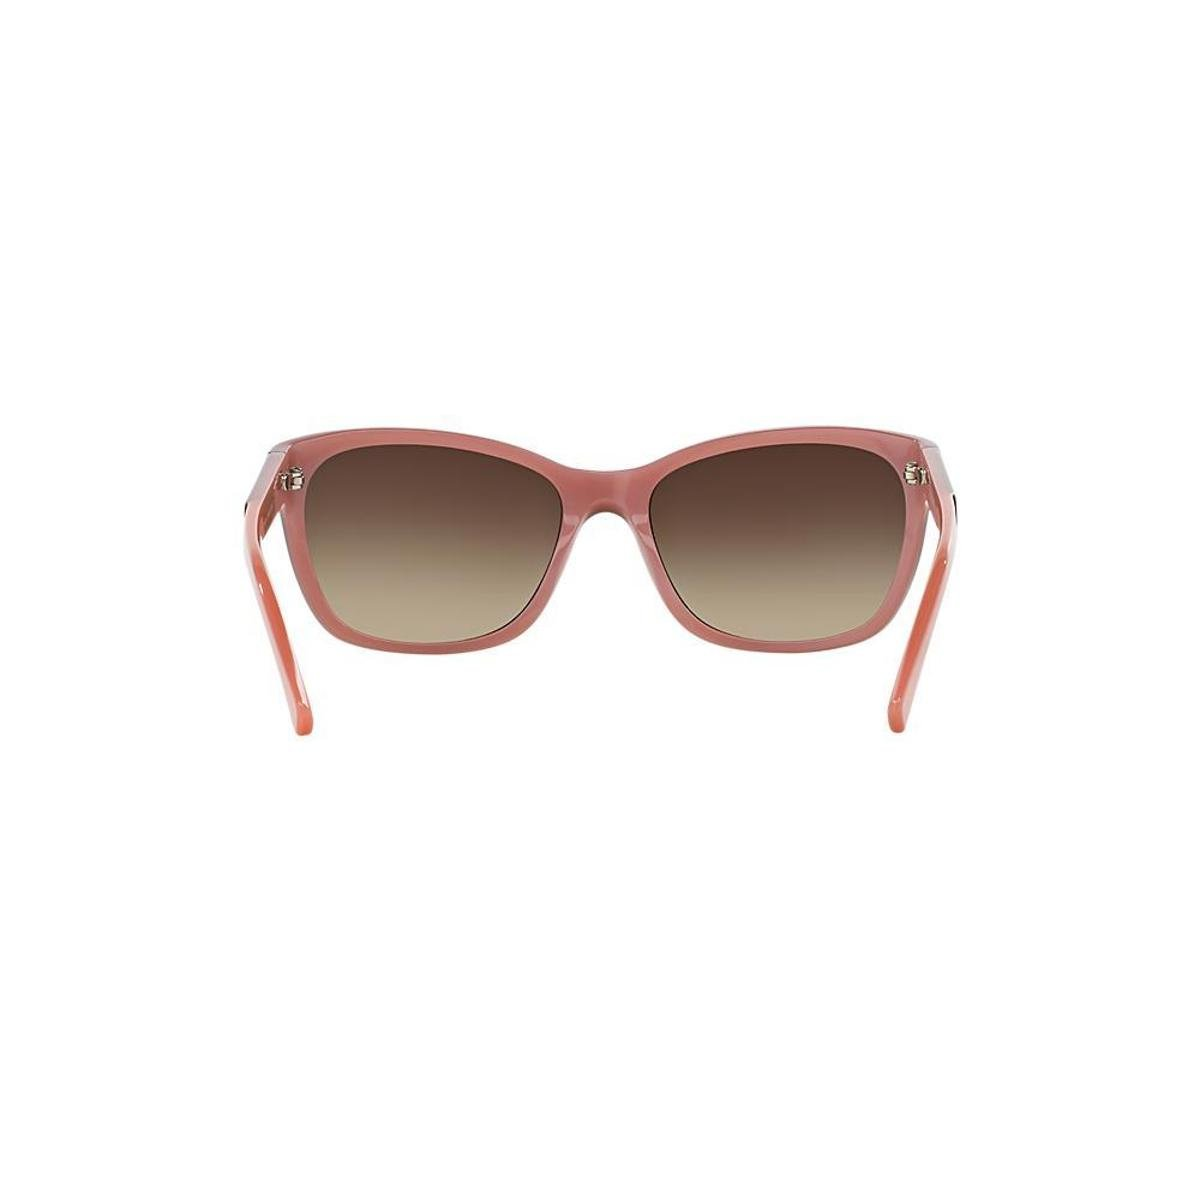 Óculos de Sol Emporio Armani Quadrado EA4004 Feminino - Compre Agora ... 3dac6a23d4db6